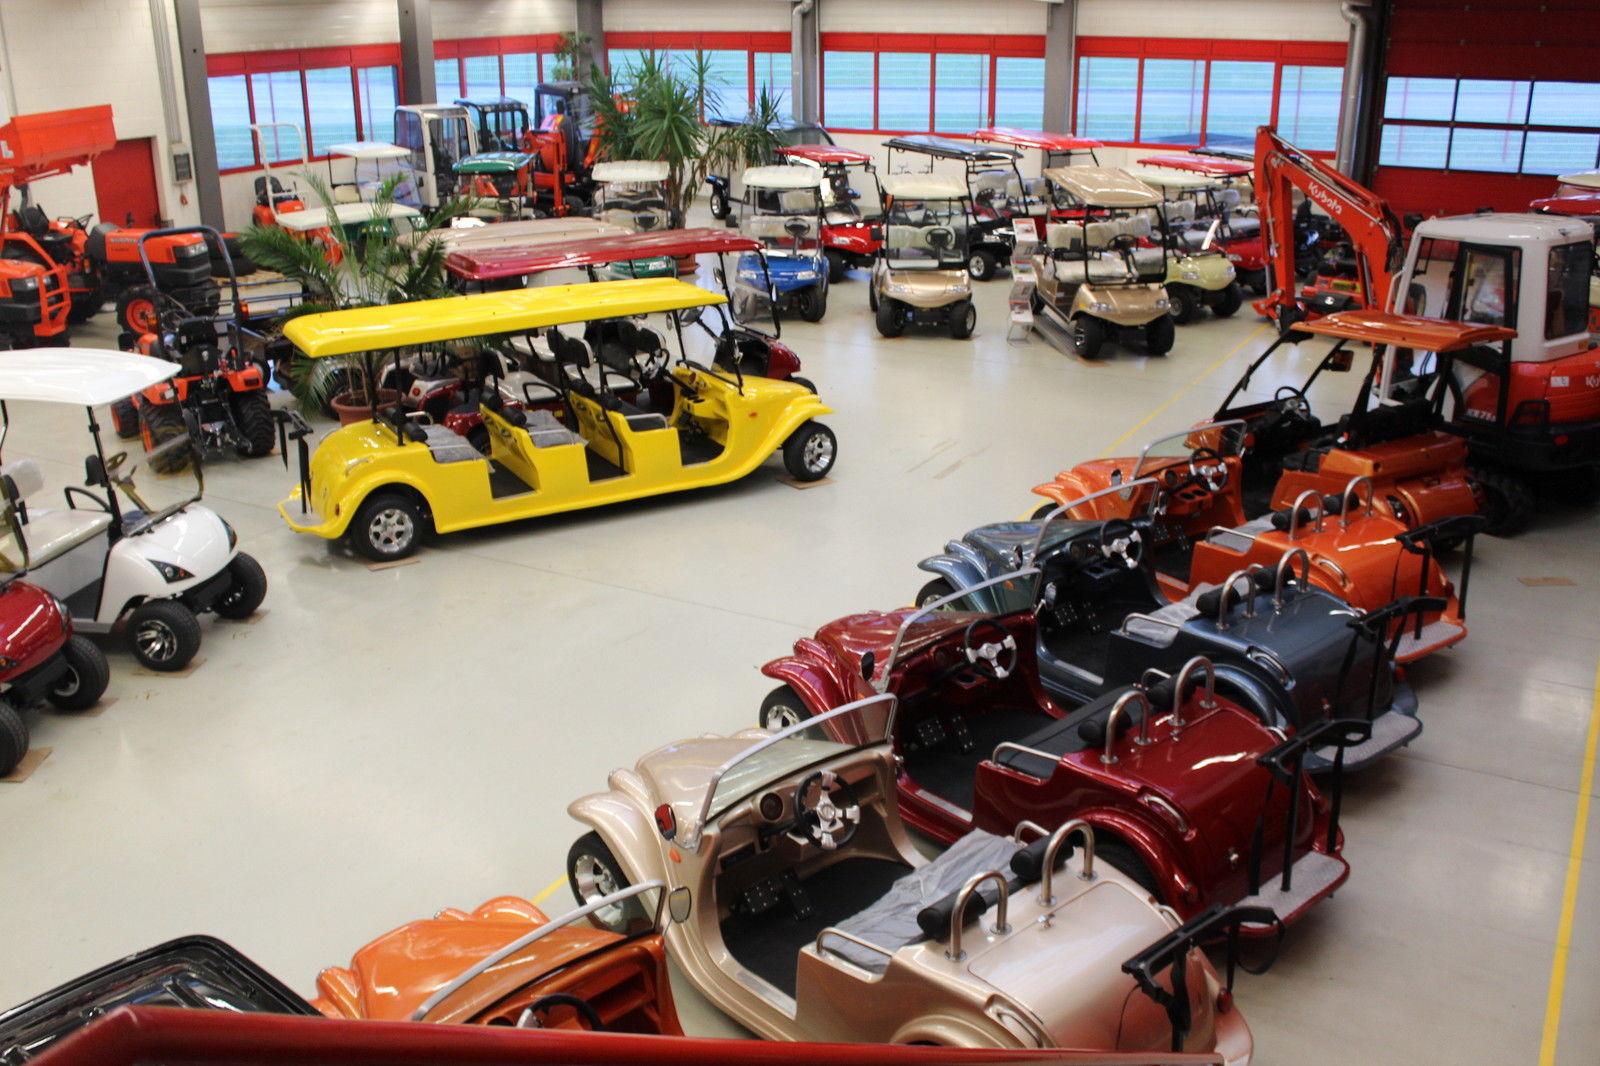 Golf Cart Center Germany Satteldorf Ausstellungsraum